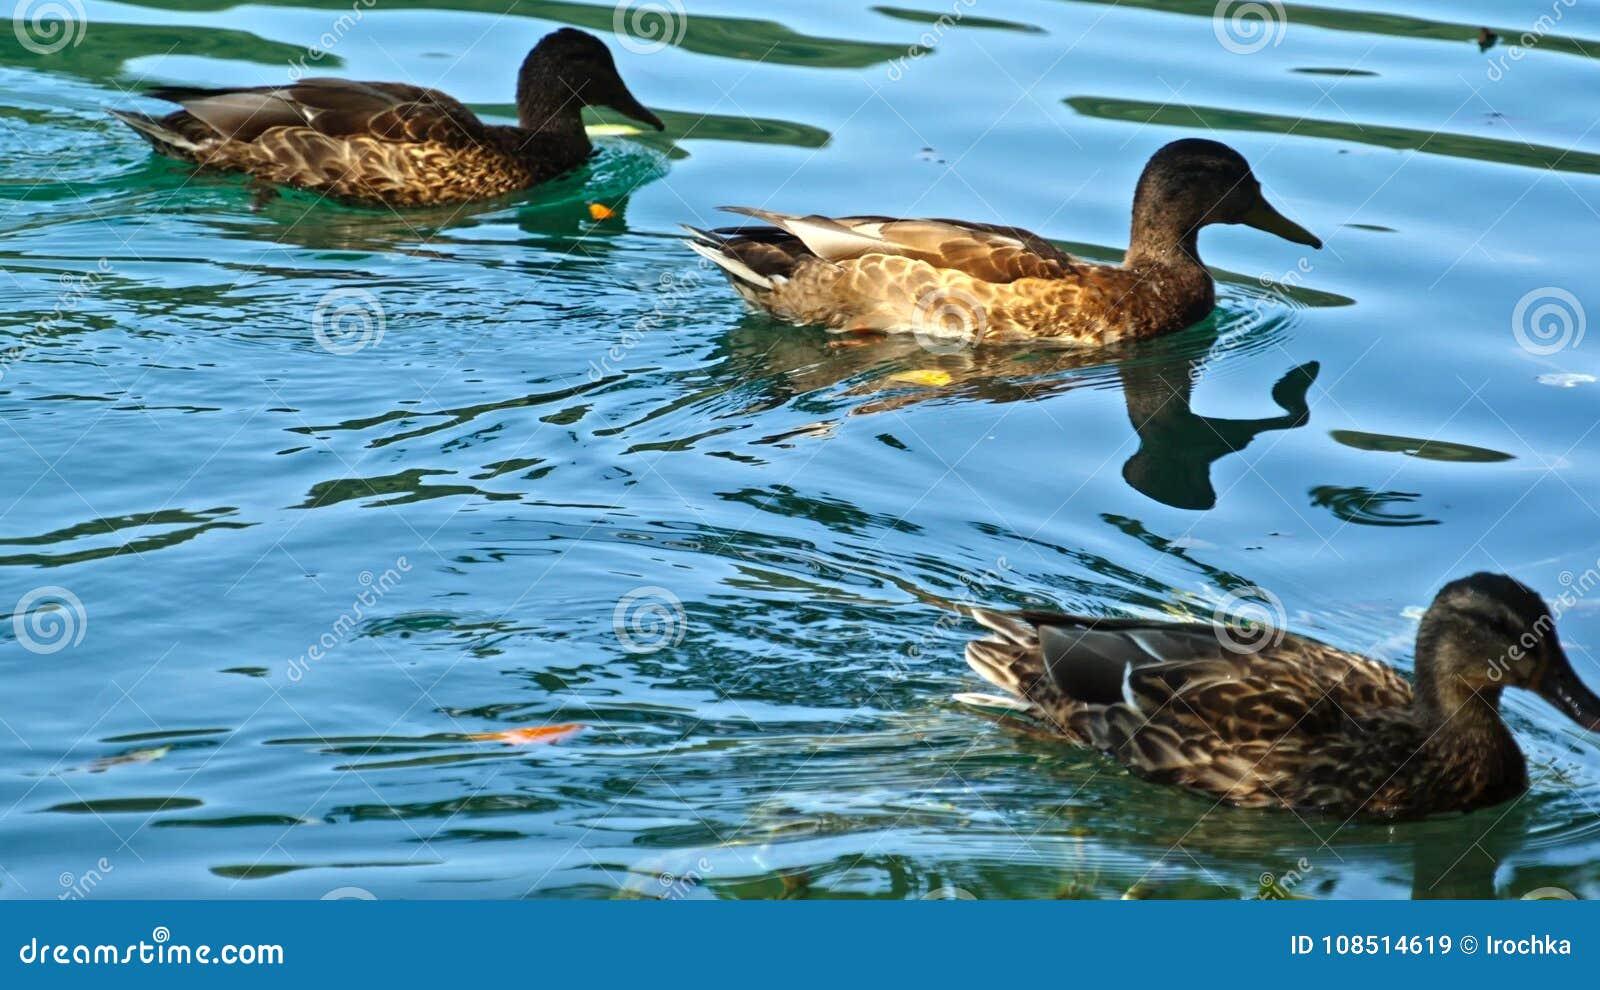 Ducks on the Plitvice Lakes in Croatia